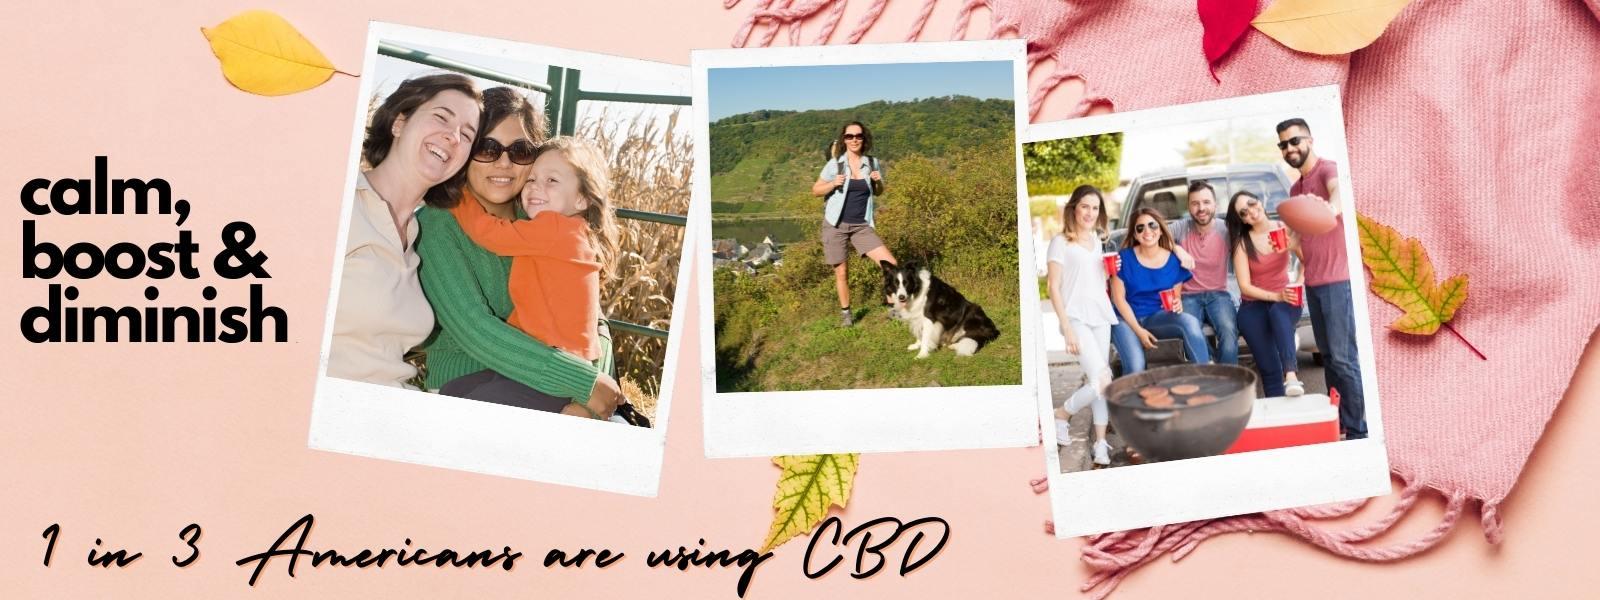 CBD Calm, Boost & Diminish